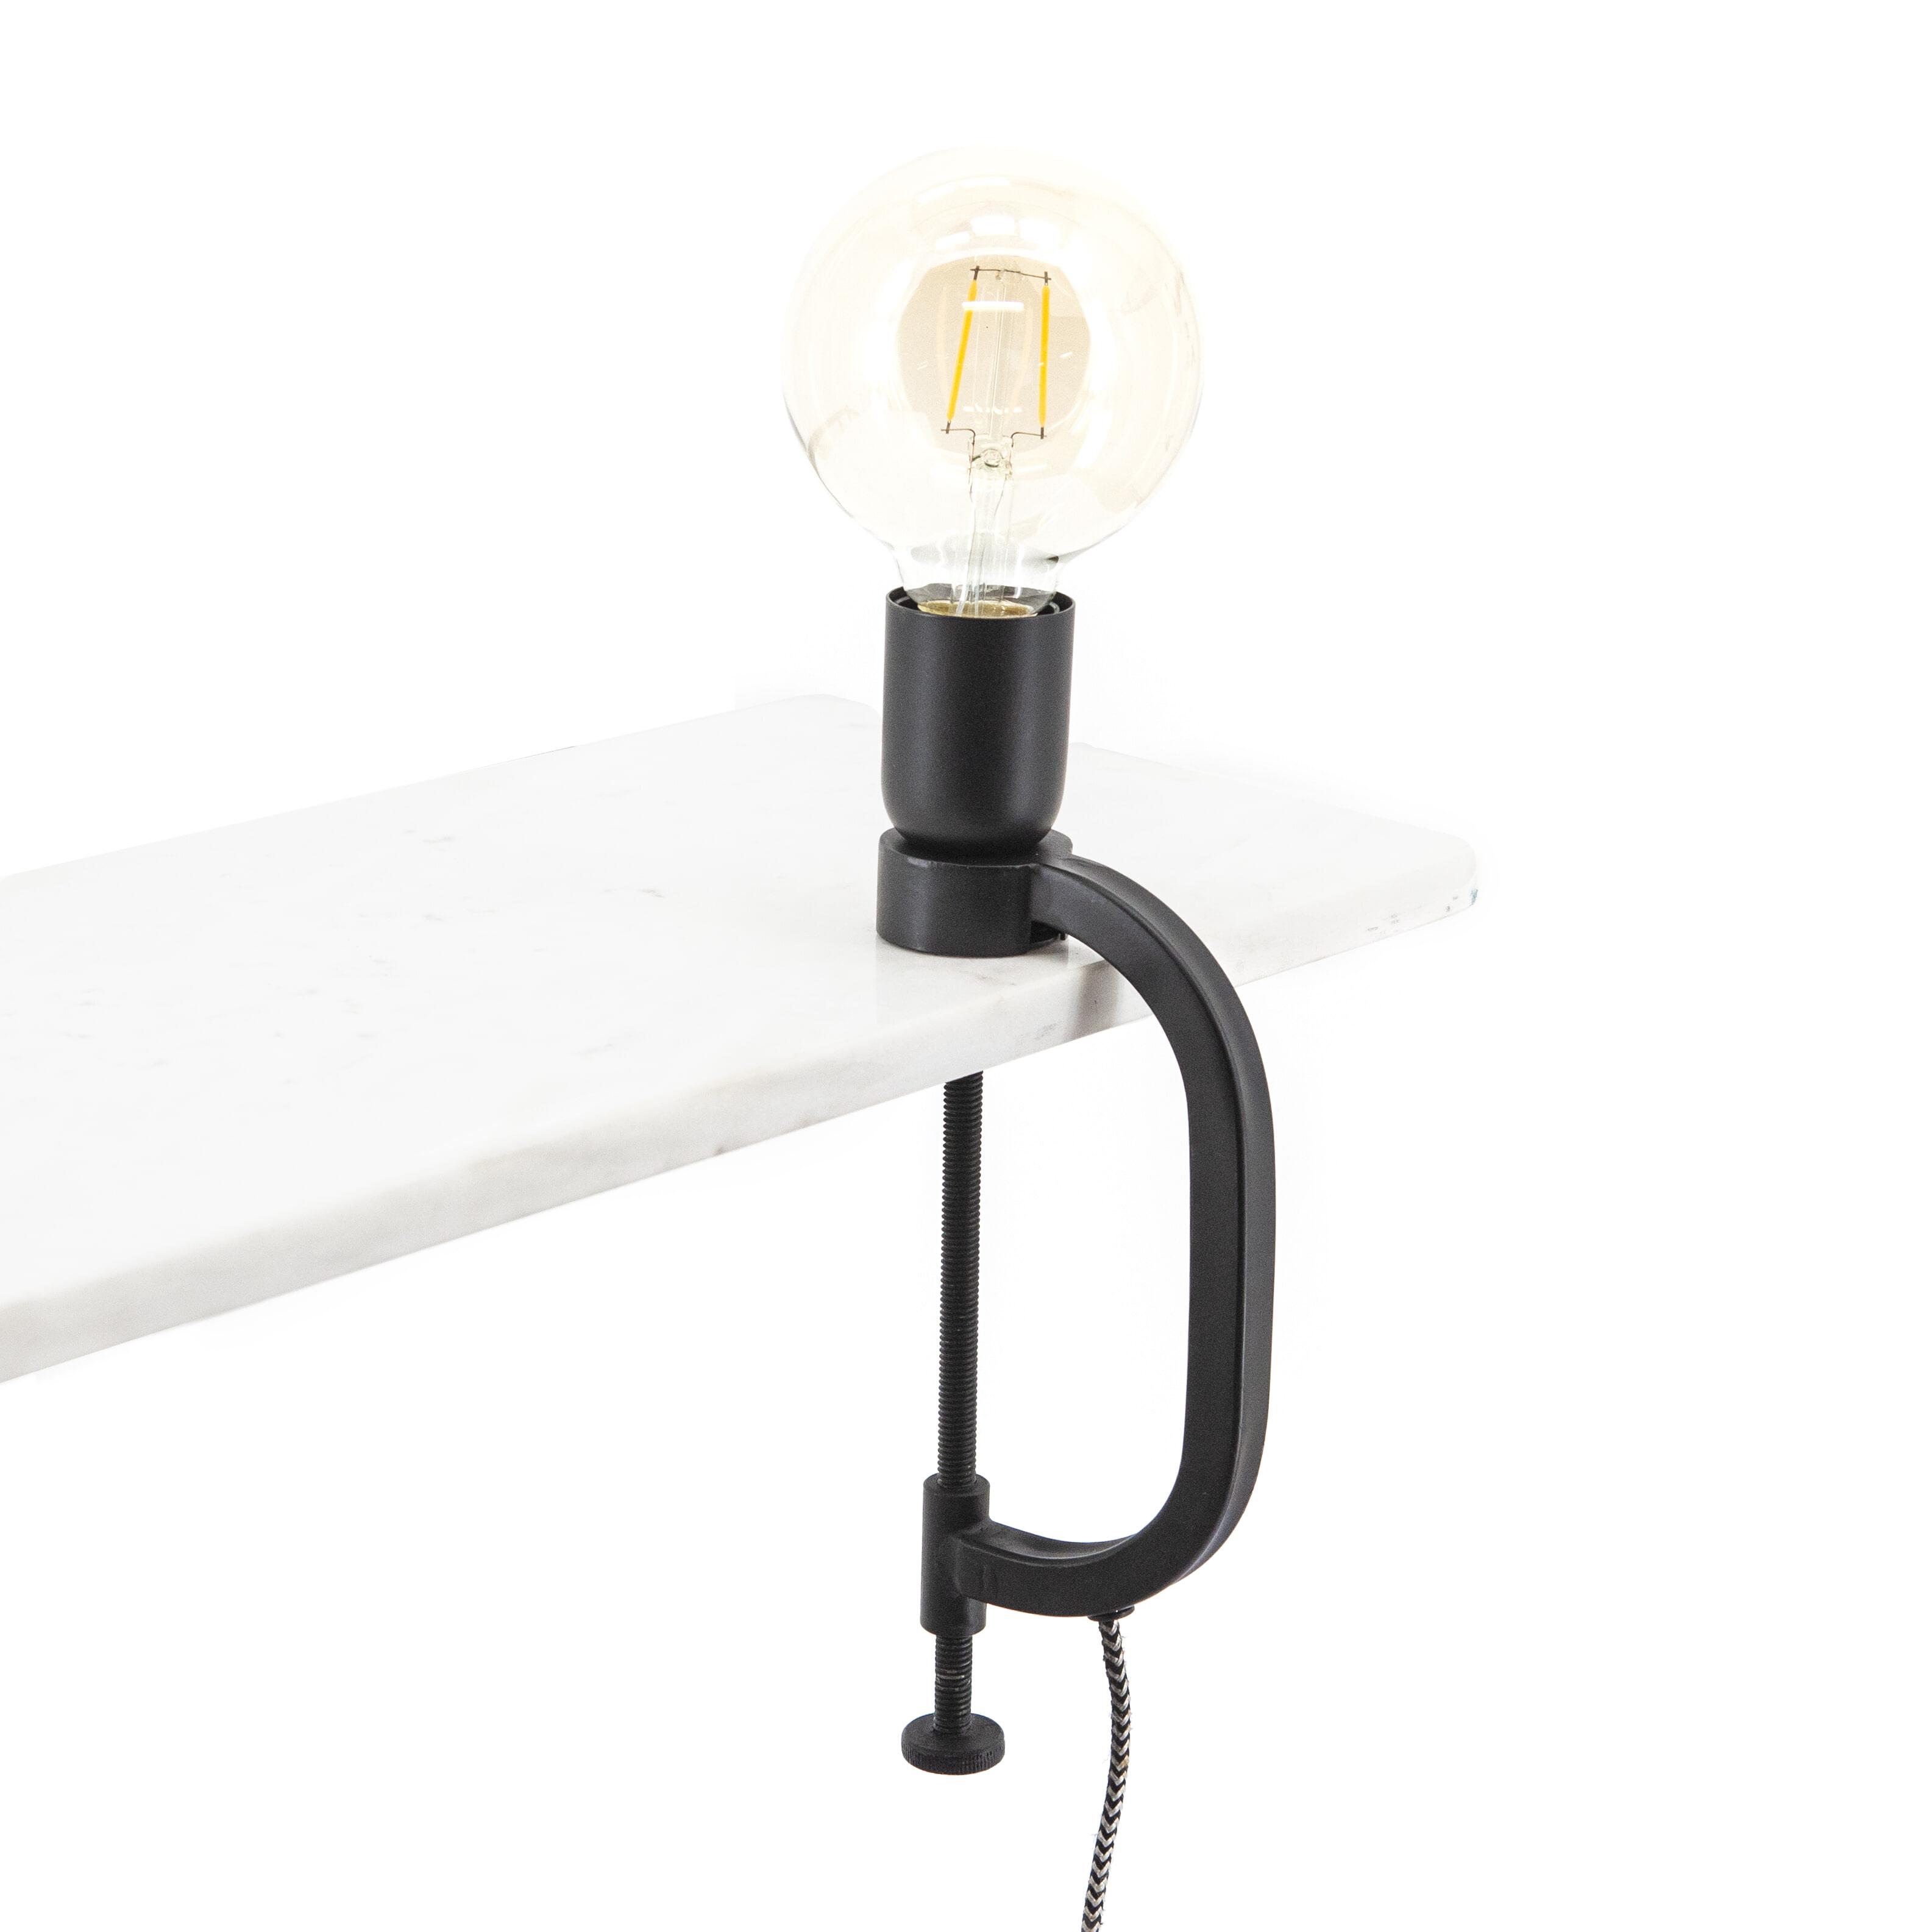 By-Boo Tafellamp 'Klamp', kleur Zwart